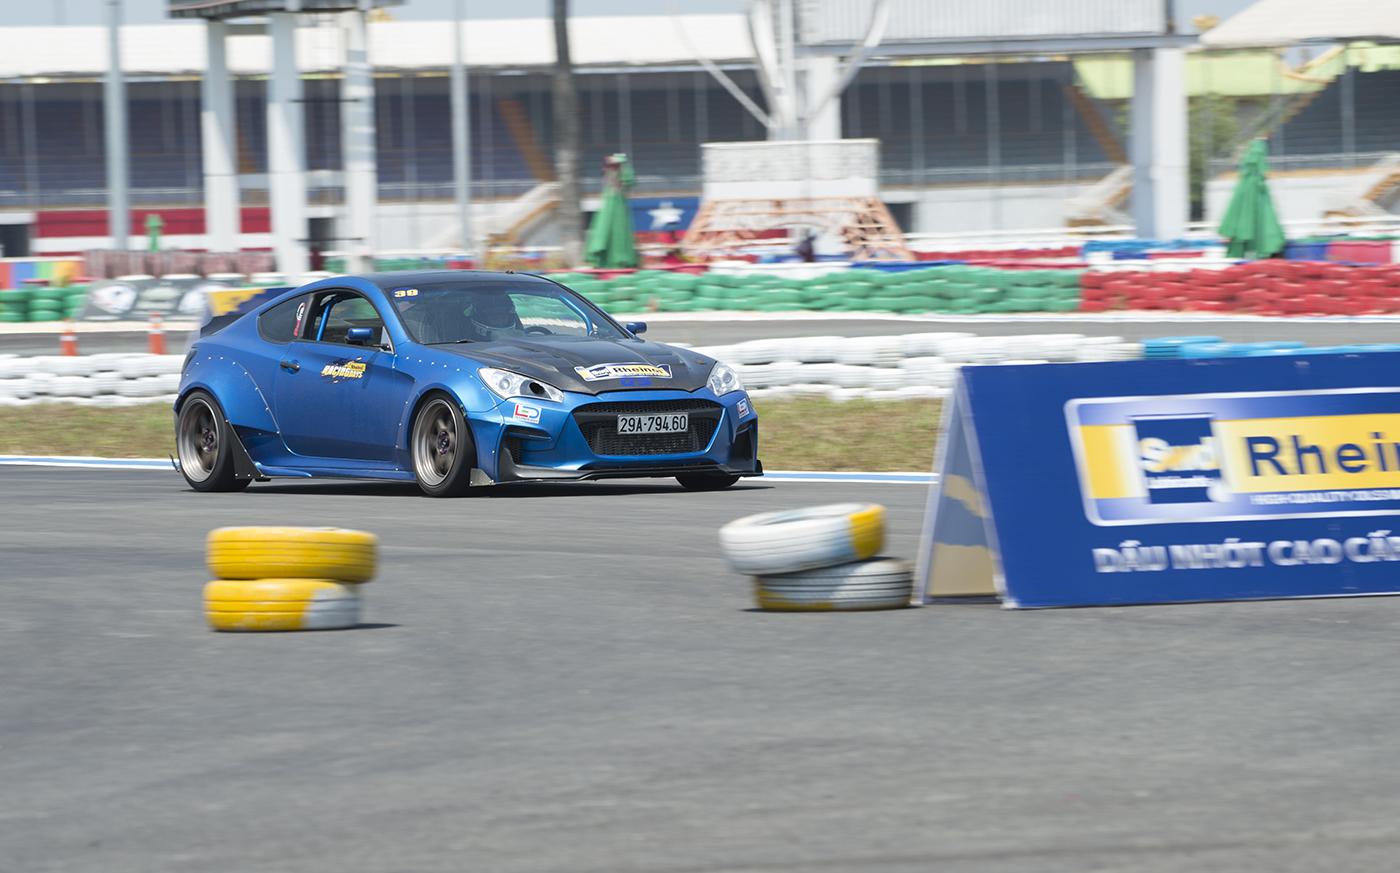 rheinol-racing-days-autodaily-0-30.jpg